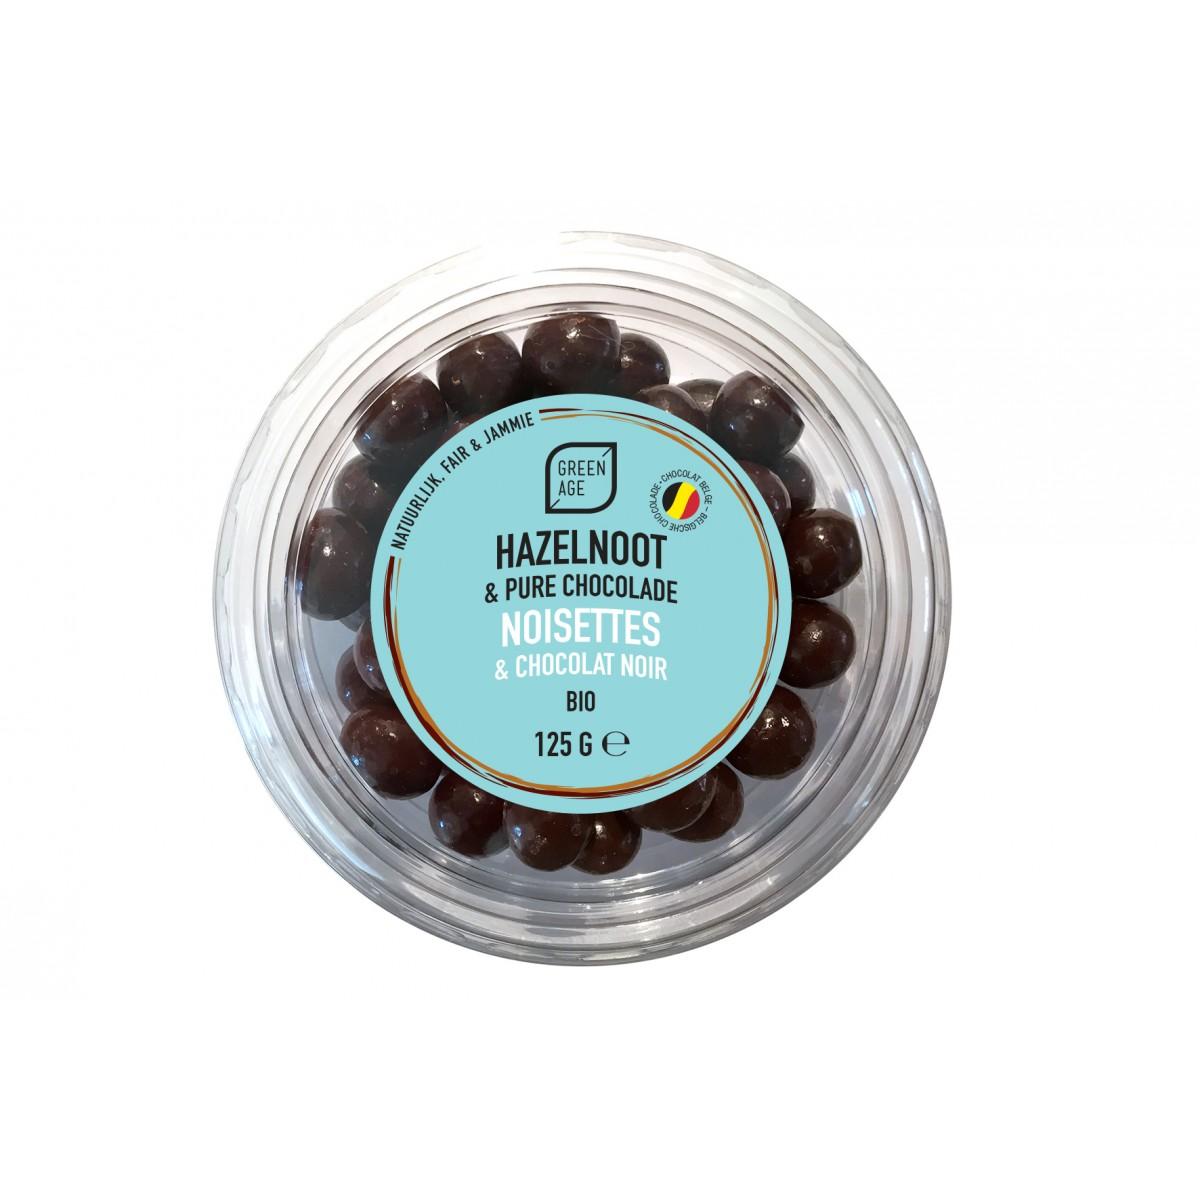 Hazelnoot & Pure Chocolade